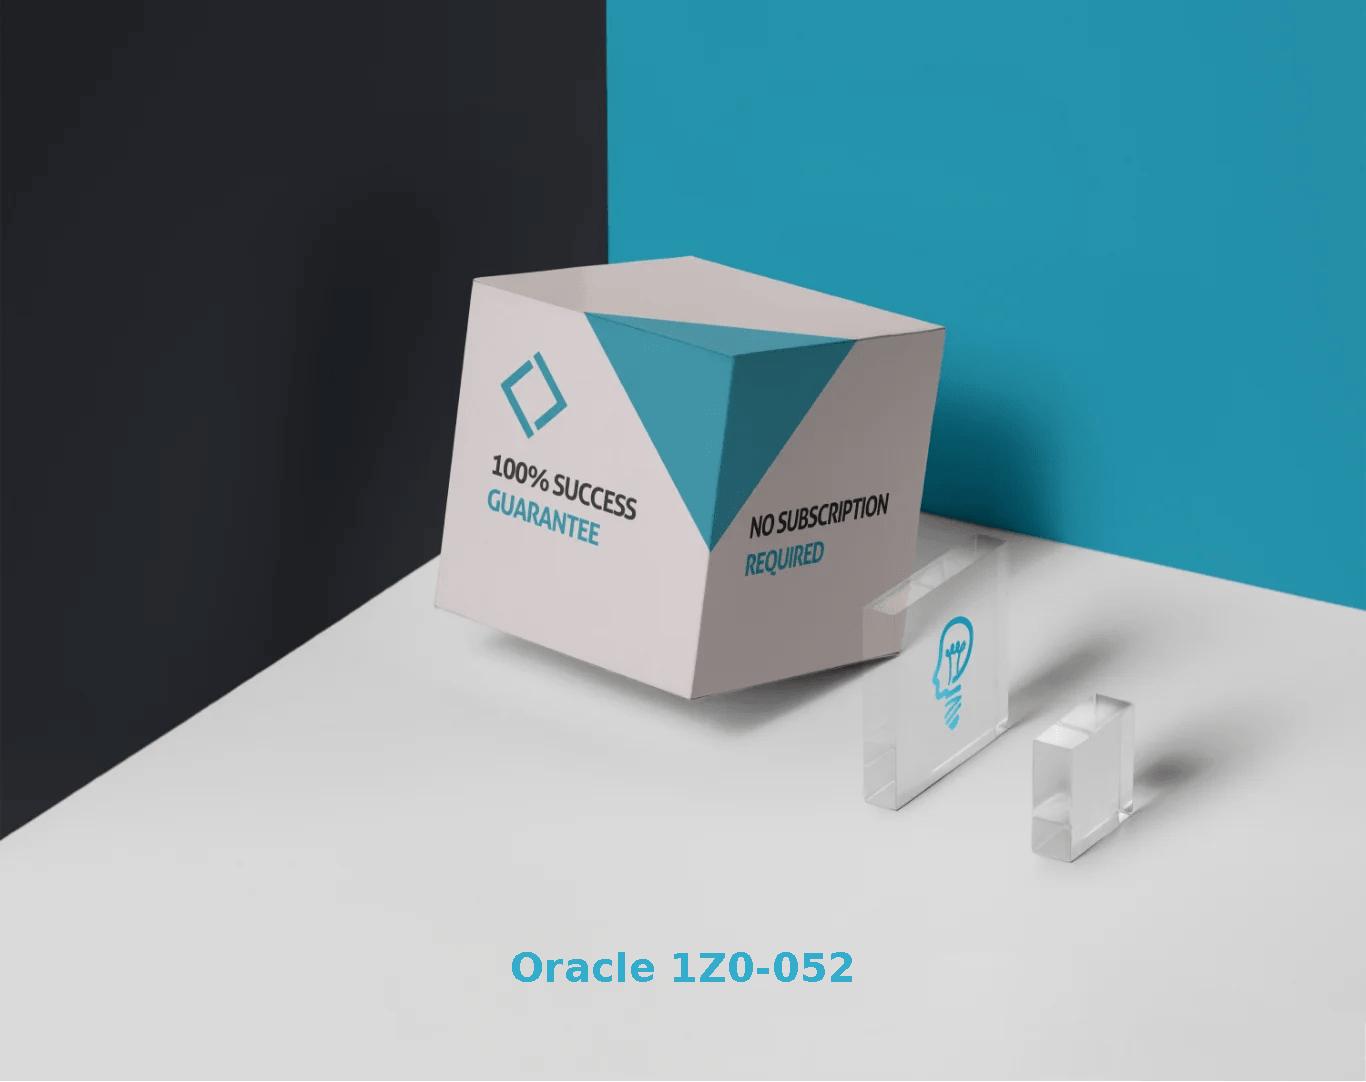 Oracle 1Z0-052 Exams